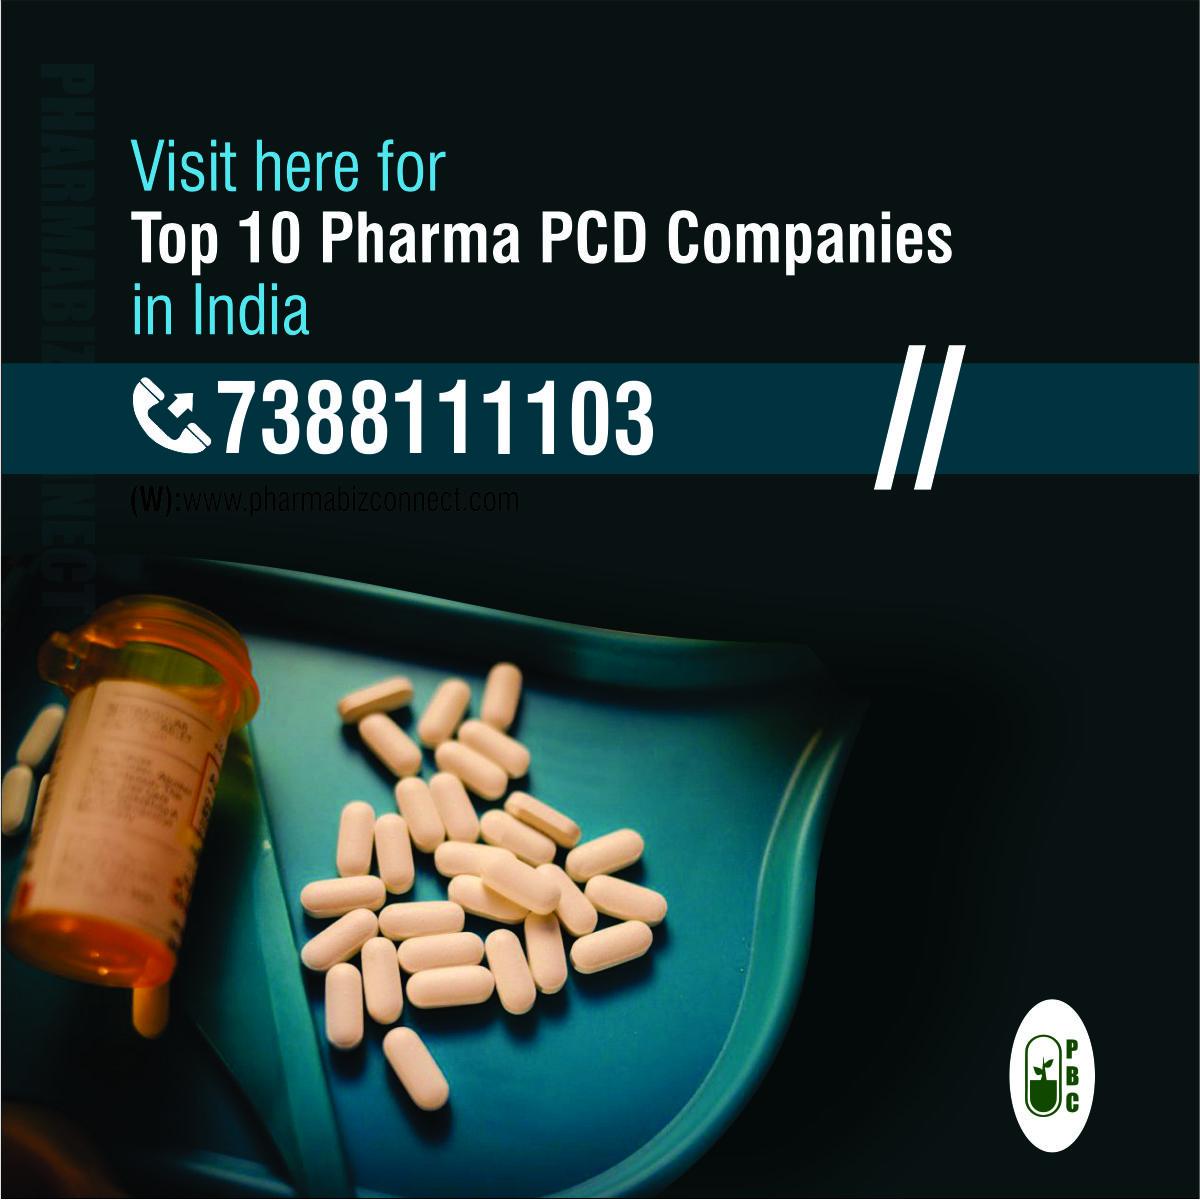 Pcd Pharma Companies In India